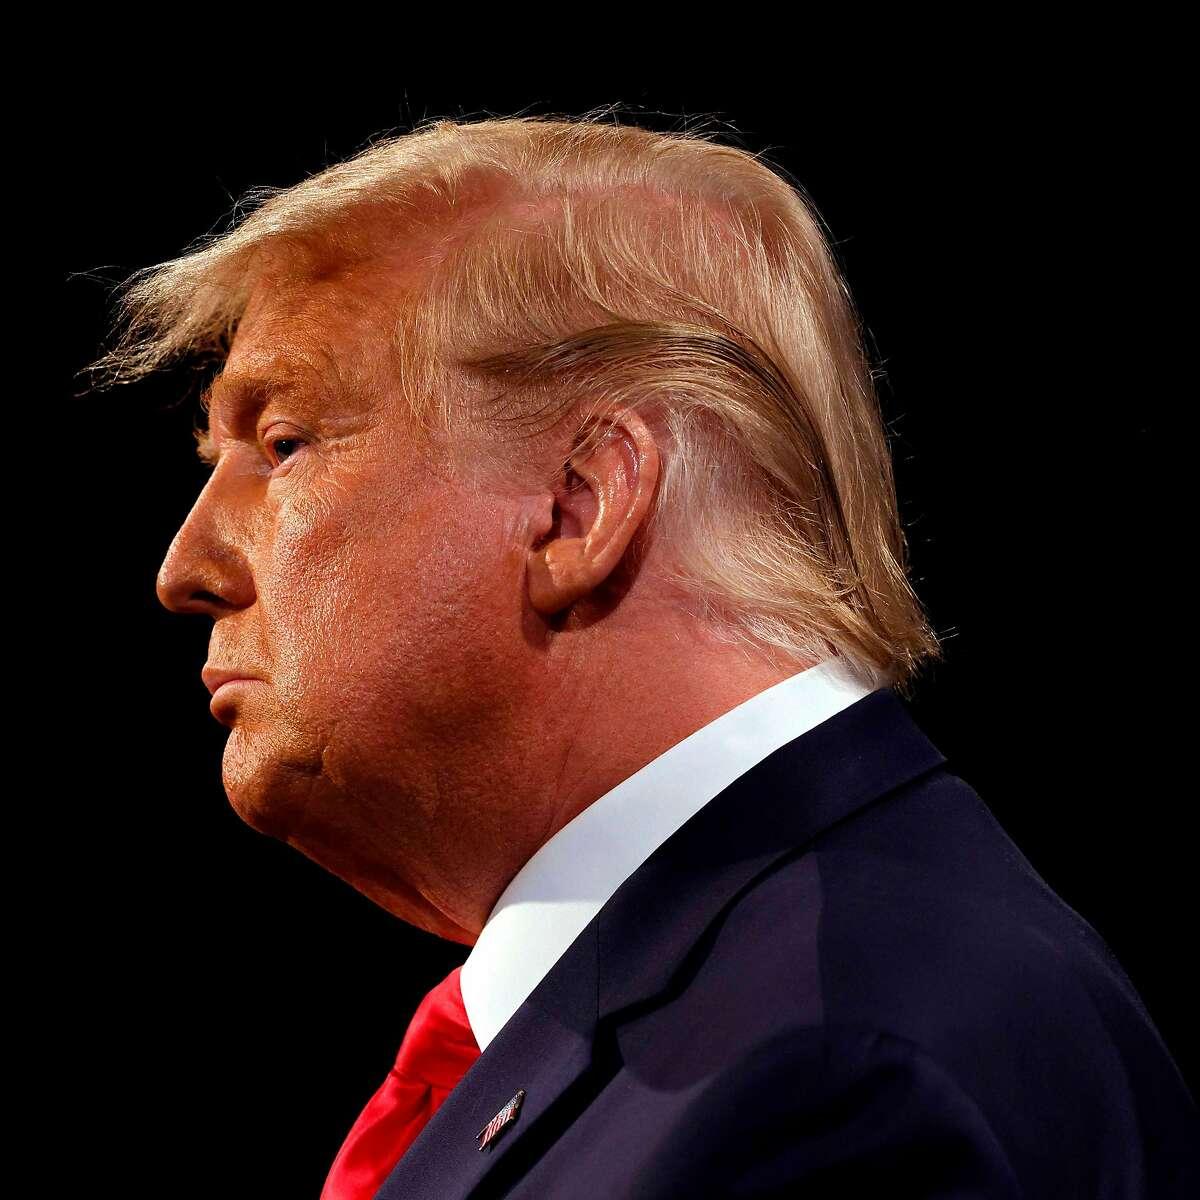 President Trump participates in the final presidential debate at Belmont University in Nashville.